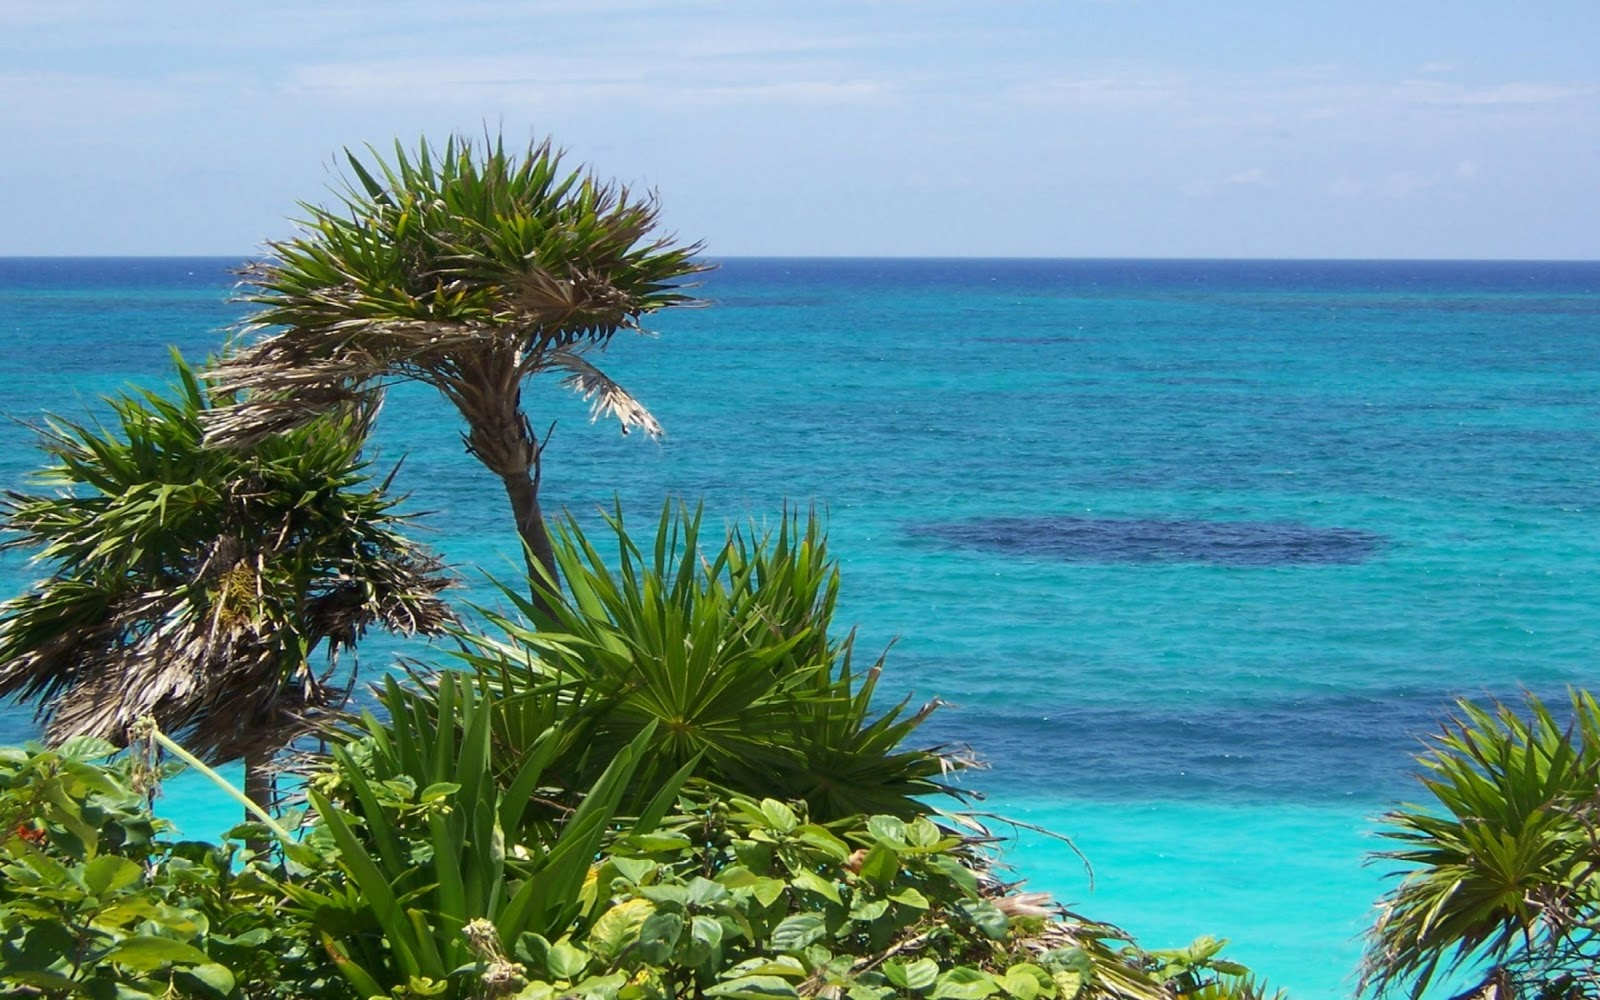 http://4.bp.blogspot.com/_RAlP3BmEW1Q/TQN0DOBBjVI/AAAAAAAABhI/XfUS4piUXdE/s1600/30-Zomer-achtergronden-zomer-wallpapers-palmbomen-en-tropische-zee.jpg